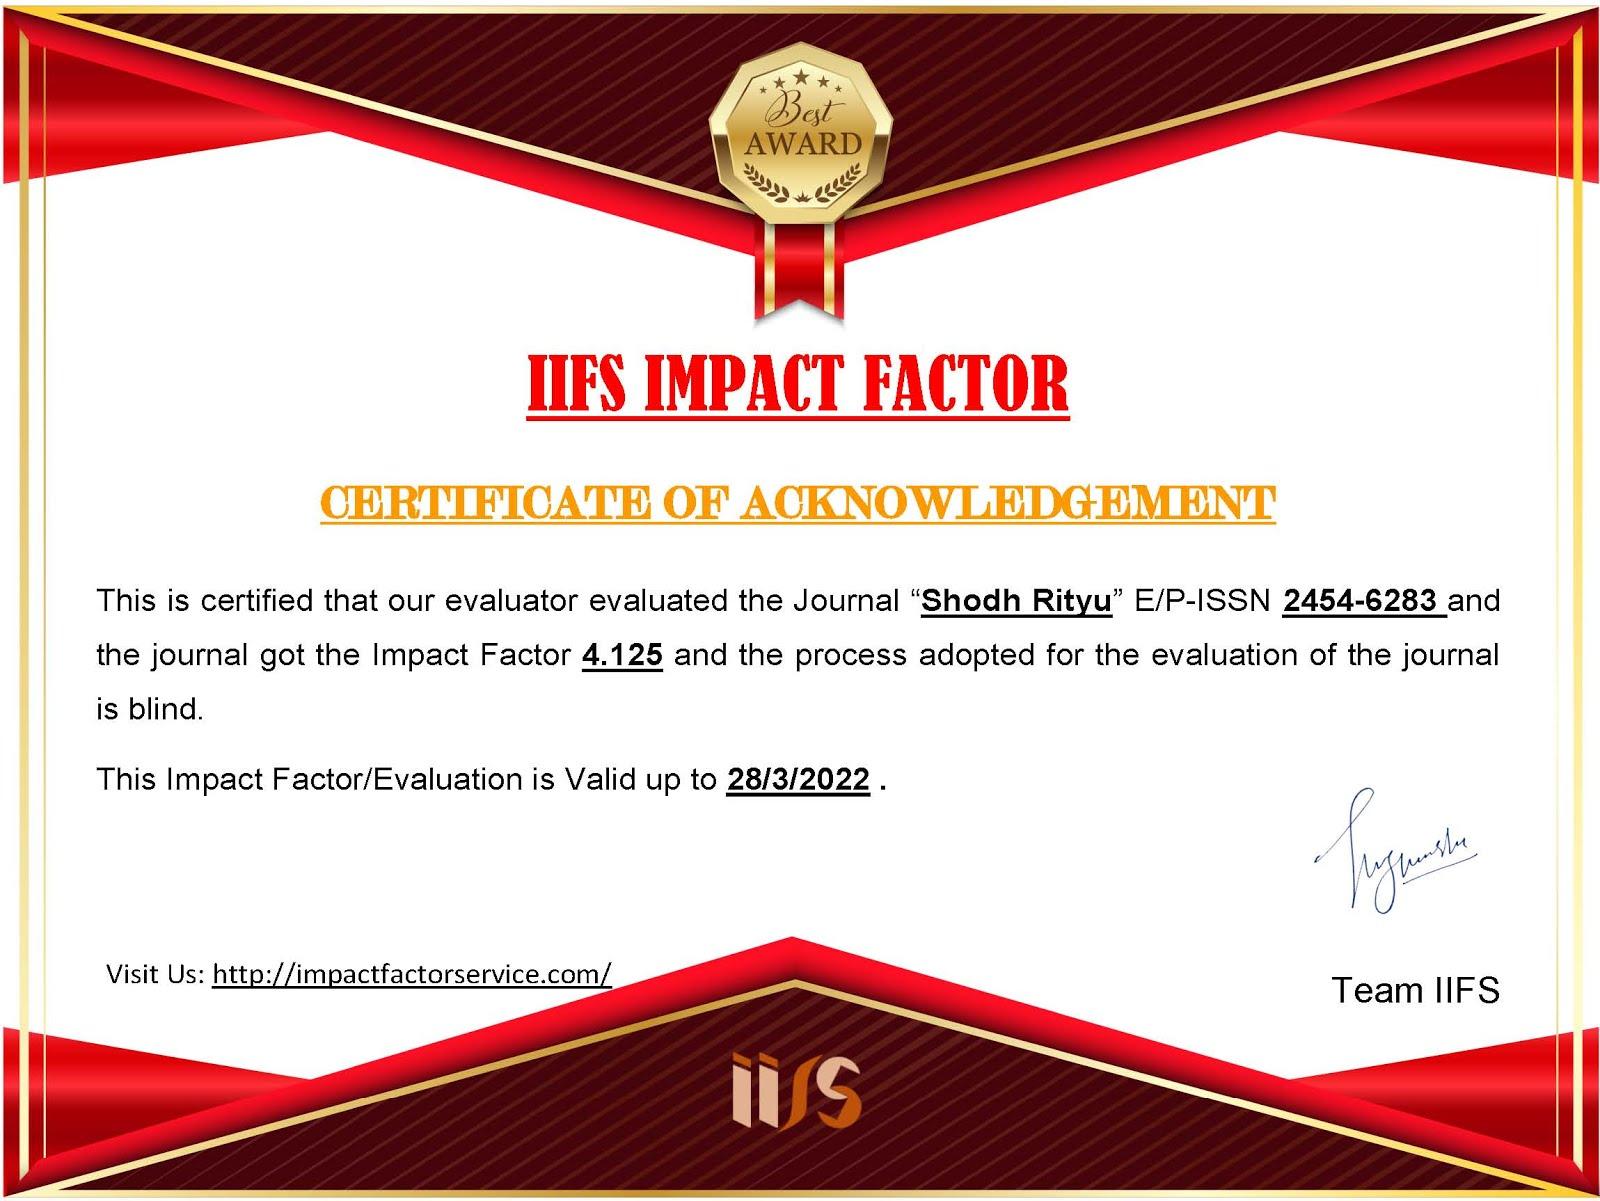 IIFS CERTIFICATE